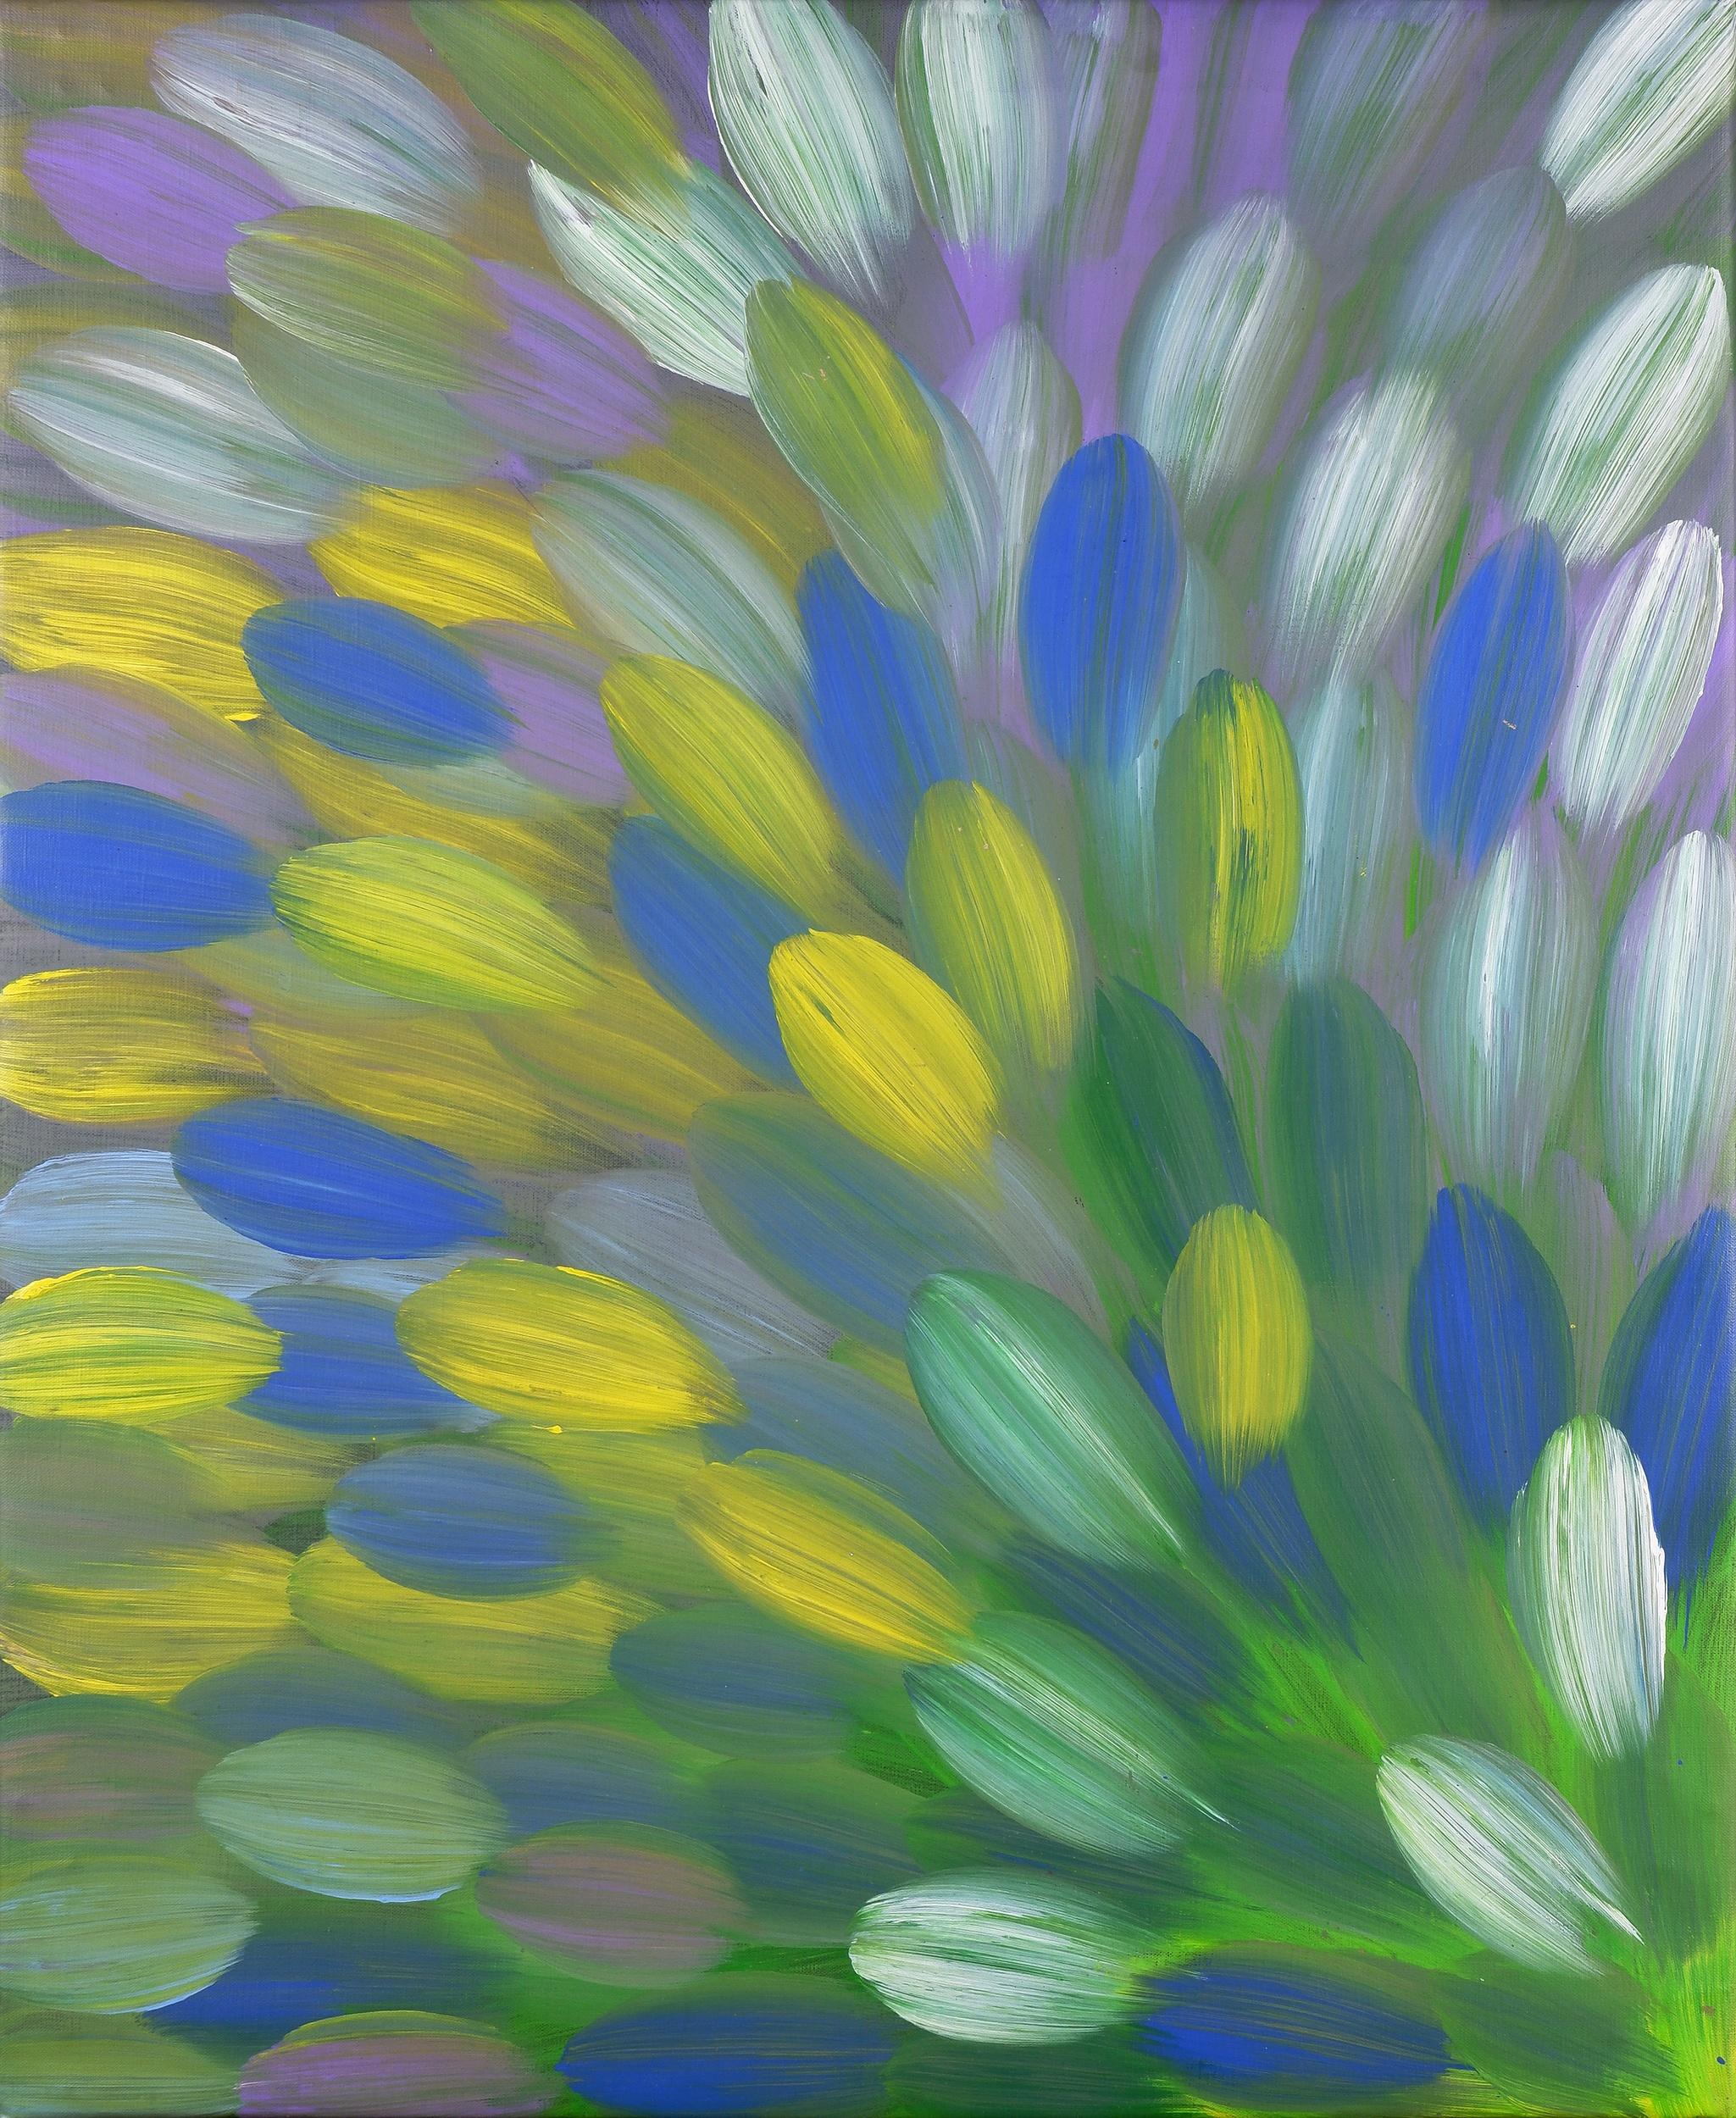 'Gloria Petyarre (born 1945, Anmatyerre language group), Bush Medicine Leaves 2016, Synthetic Polymer Paint on Canvas, 83 x 71 cm'